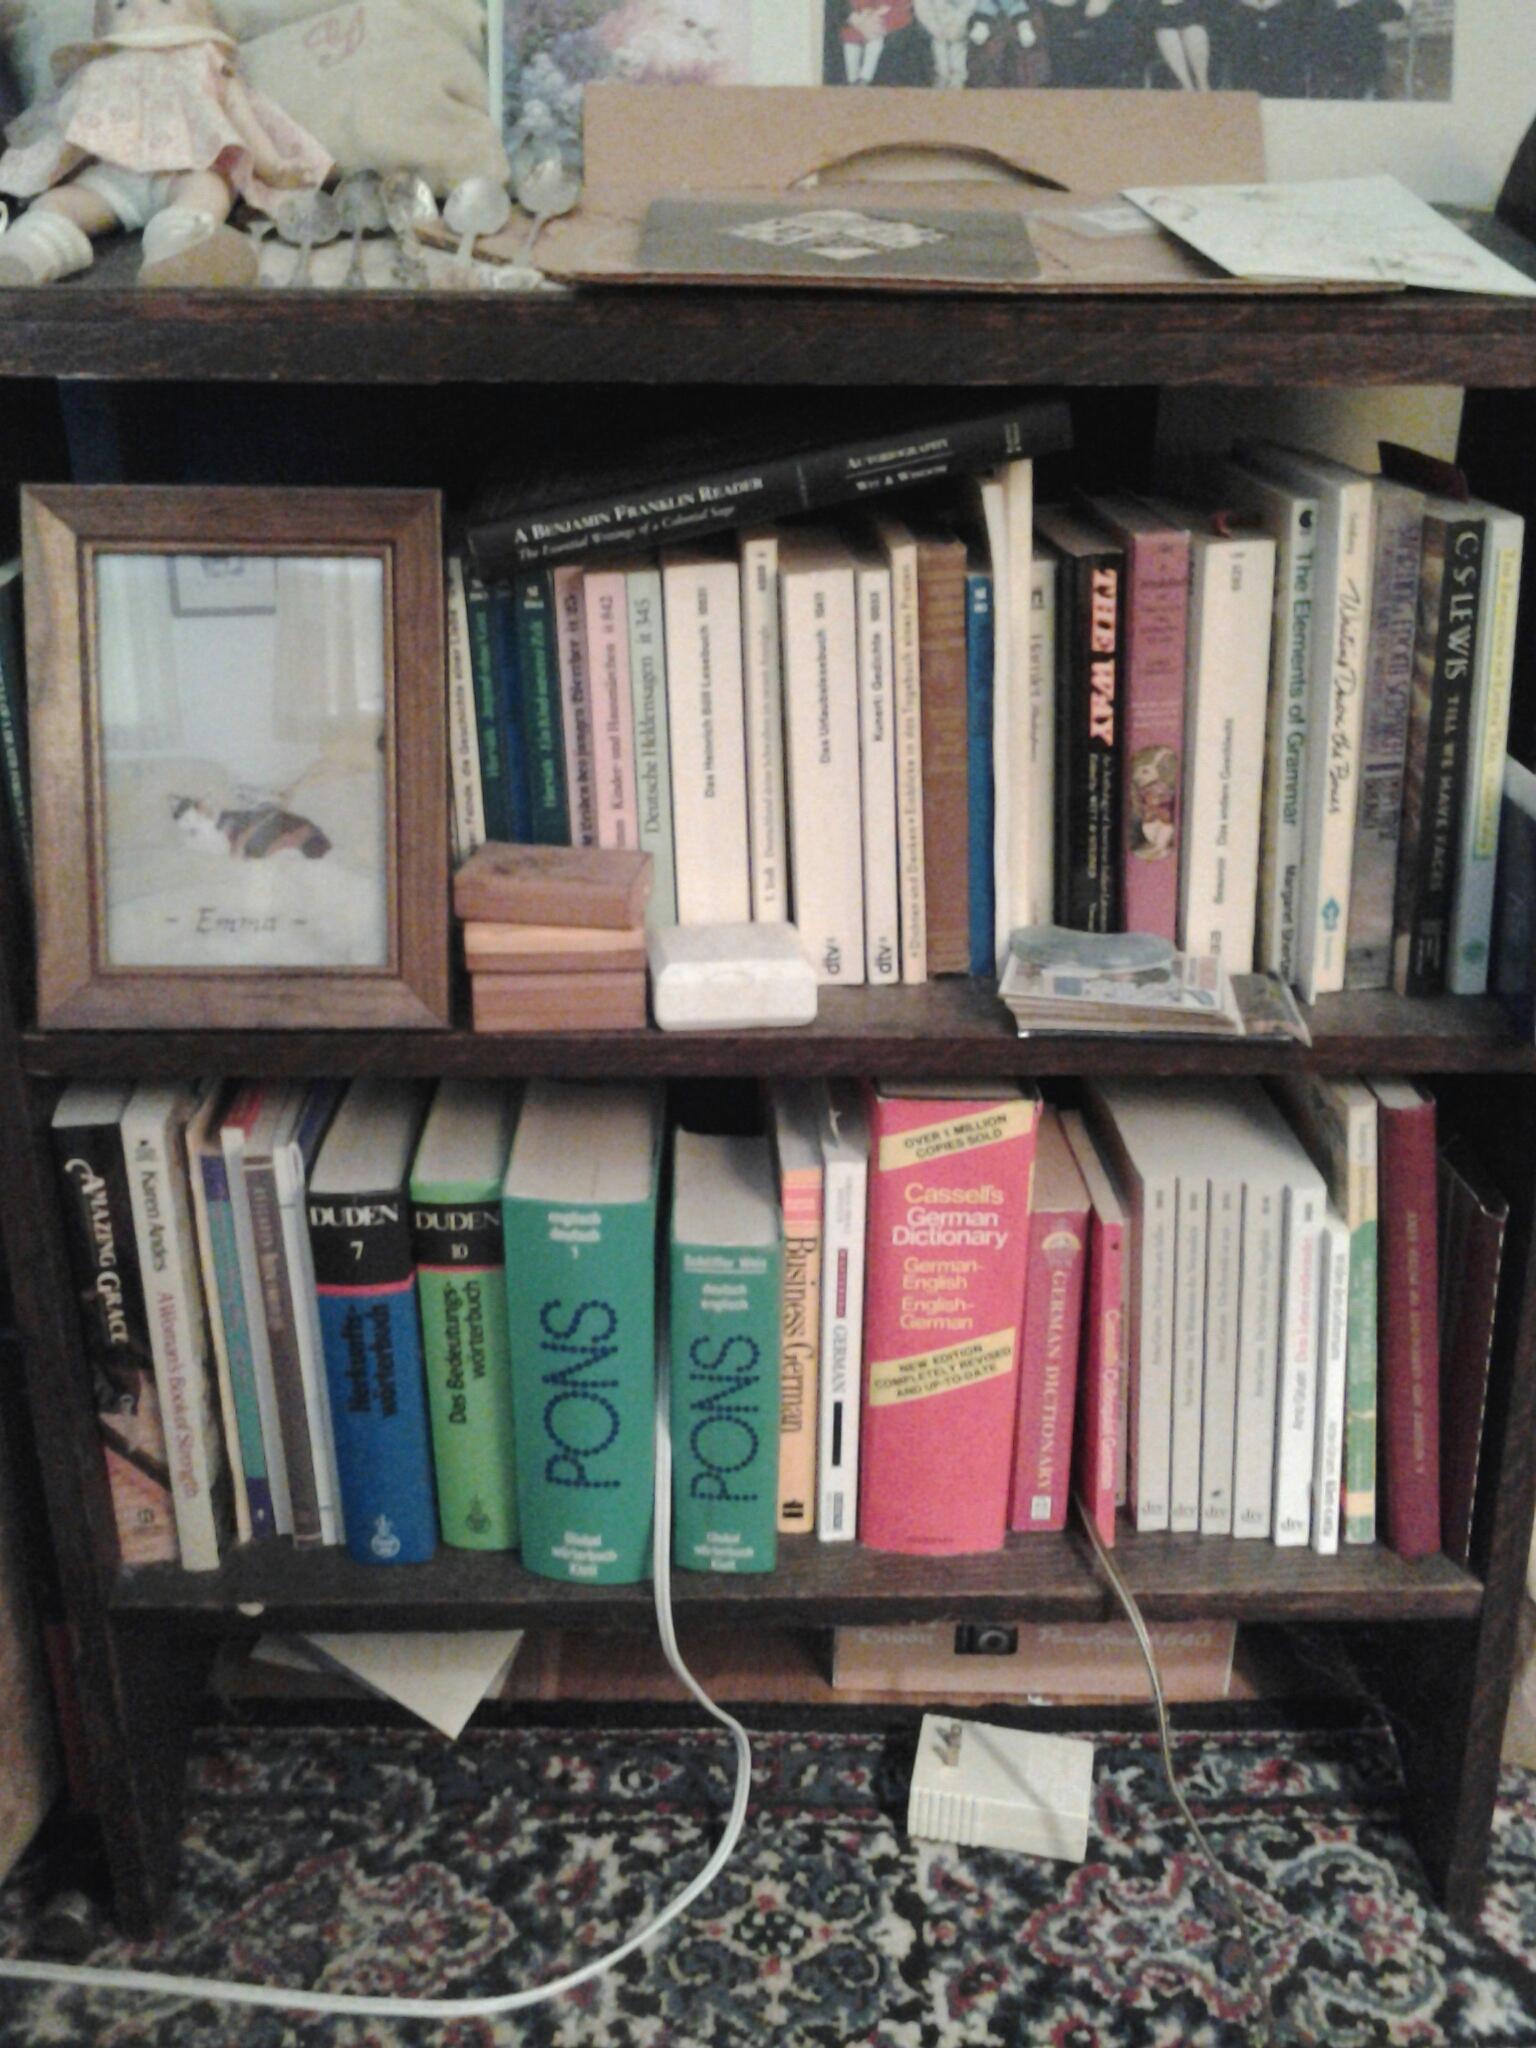 Bookshelf 5 - Ancestry, German, childhood significance